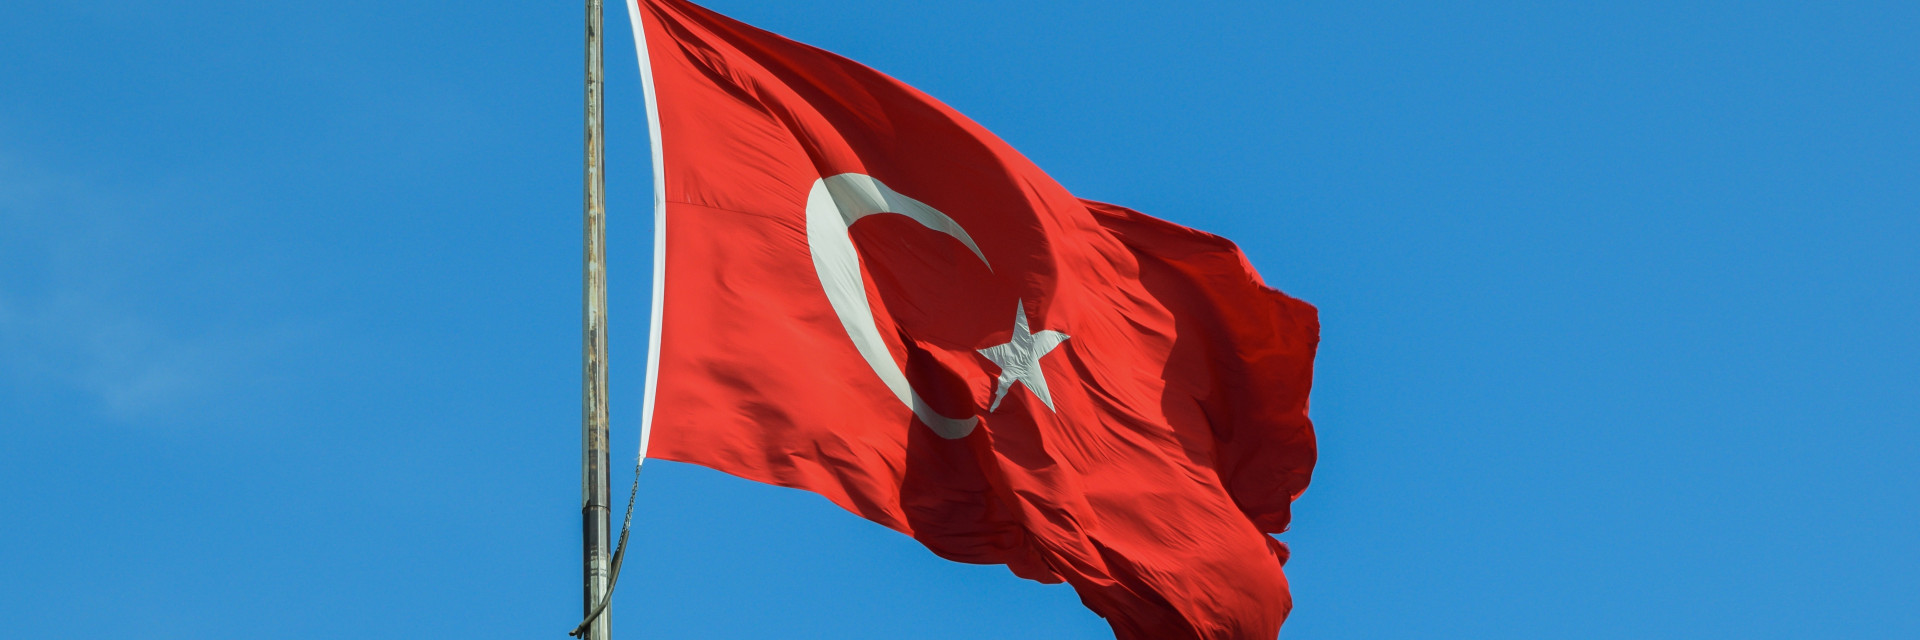 National Symbols of Turkey